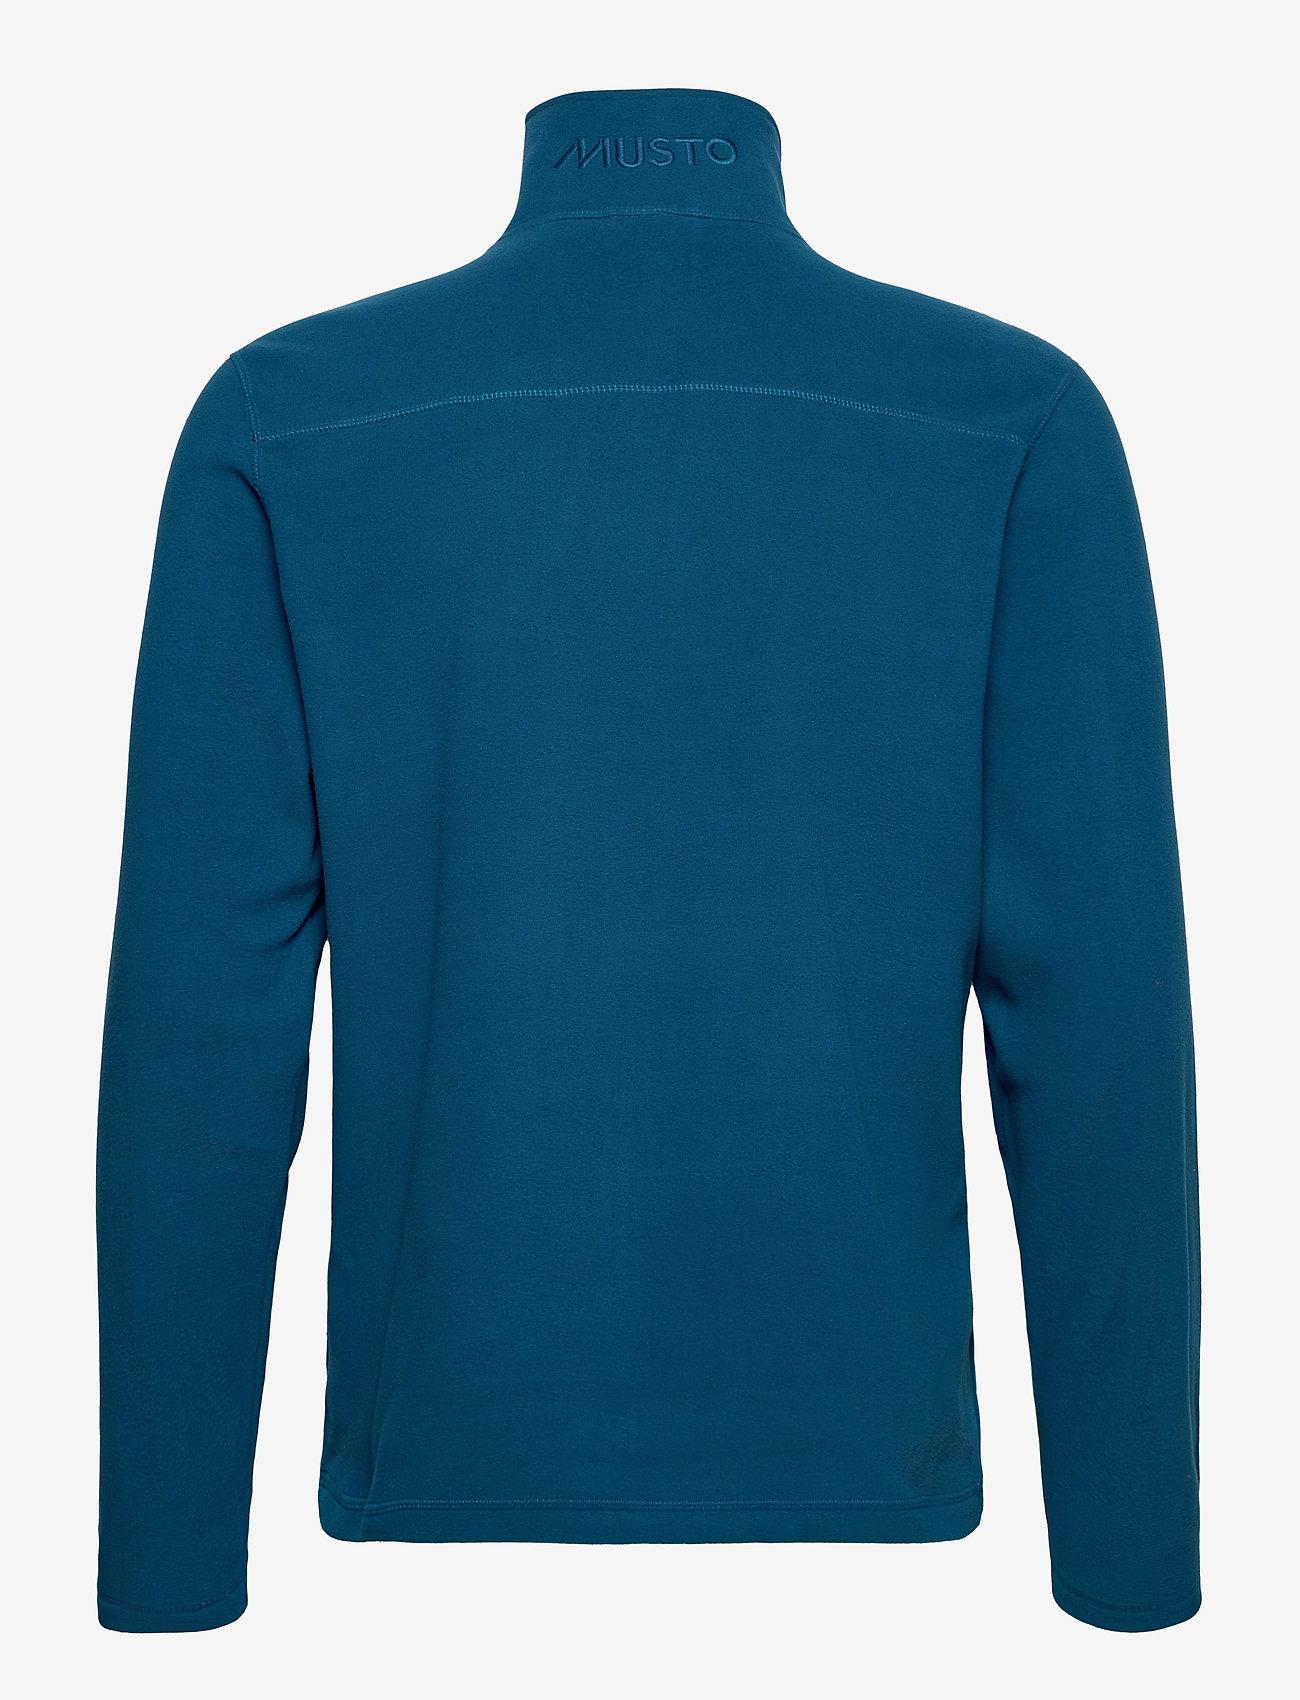 Musto - CORSICA 100GM FLEECE - mid layer jackets - deep sea - 1